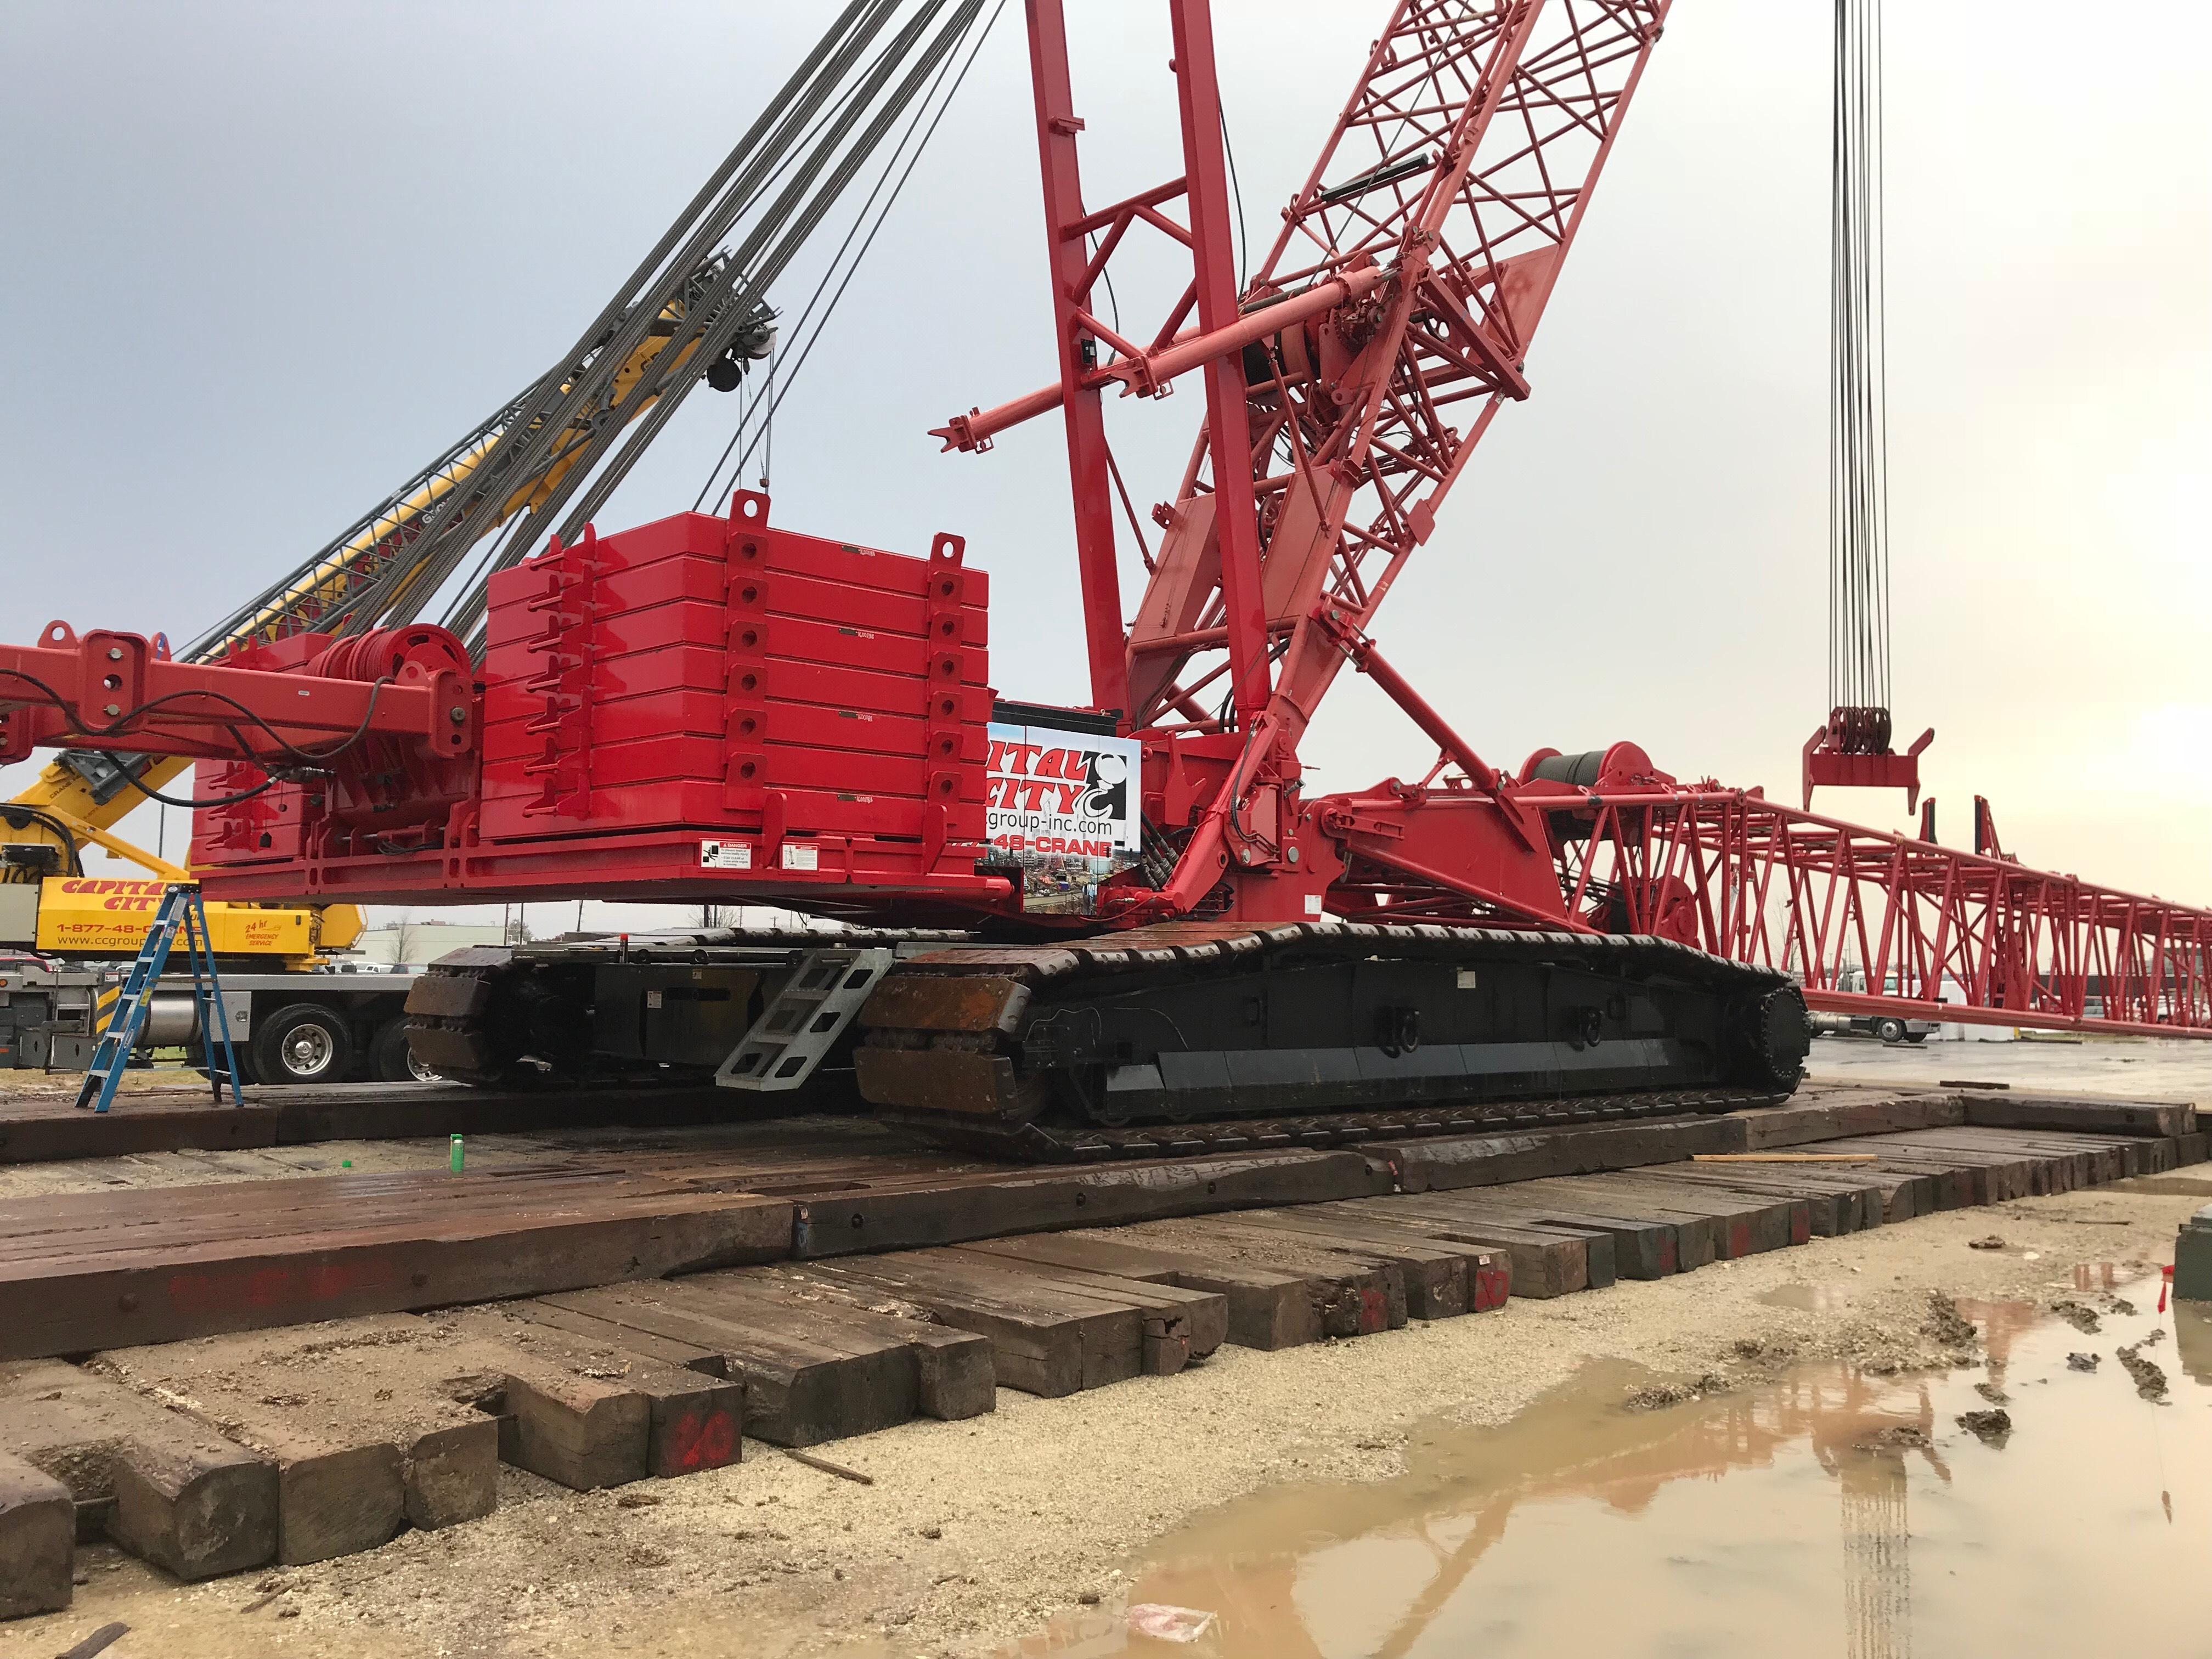 Capital City Group - Ohio Crane Rental Service Up to 825 Tons